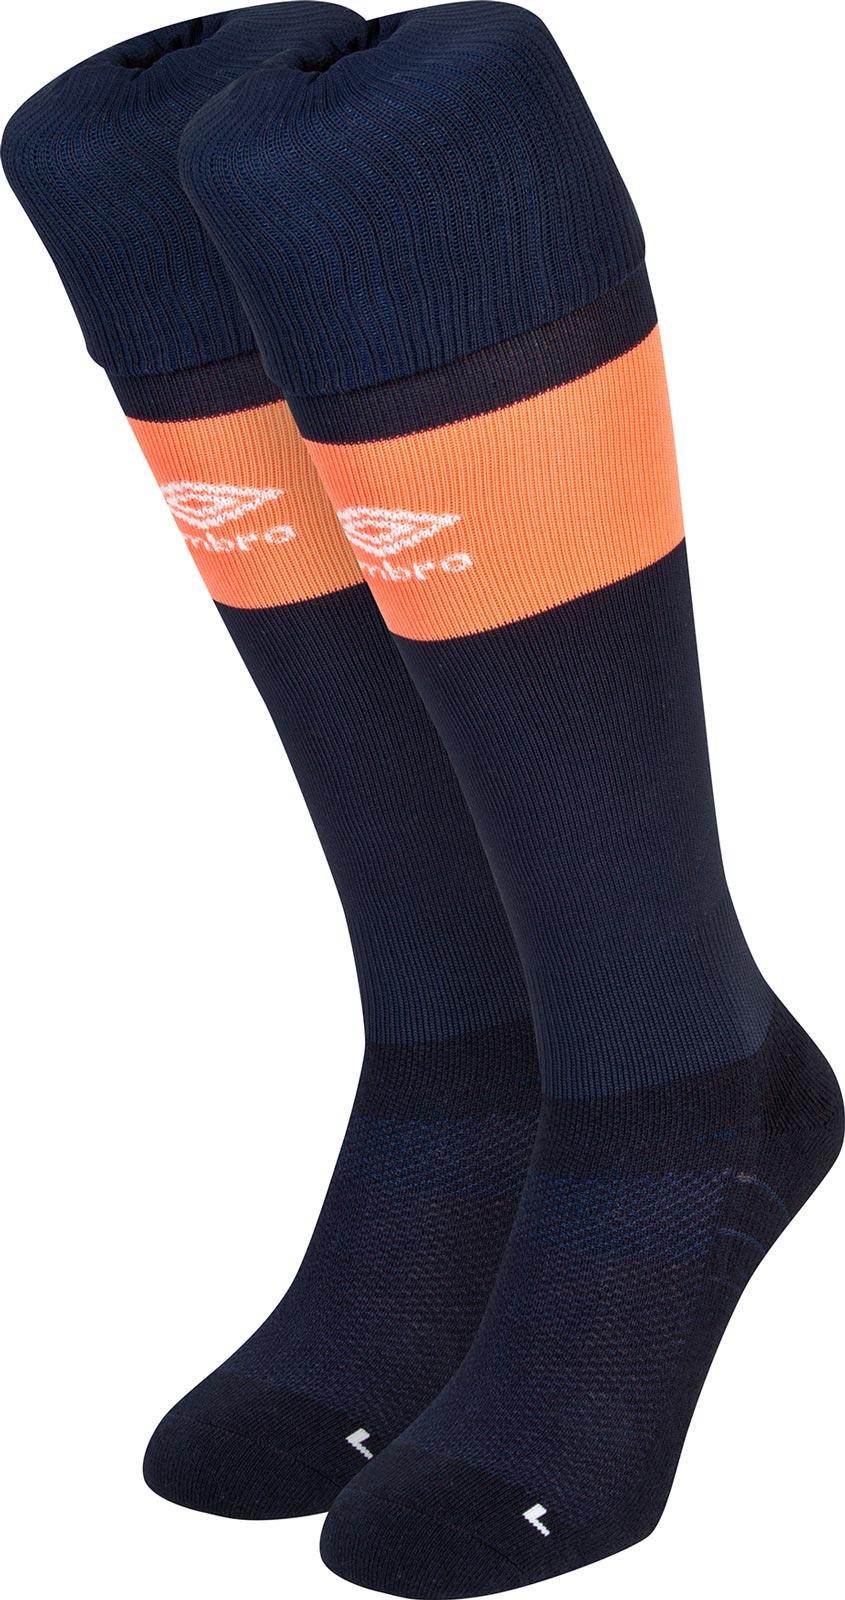 everton-16-17-away-kit-socks